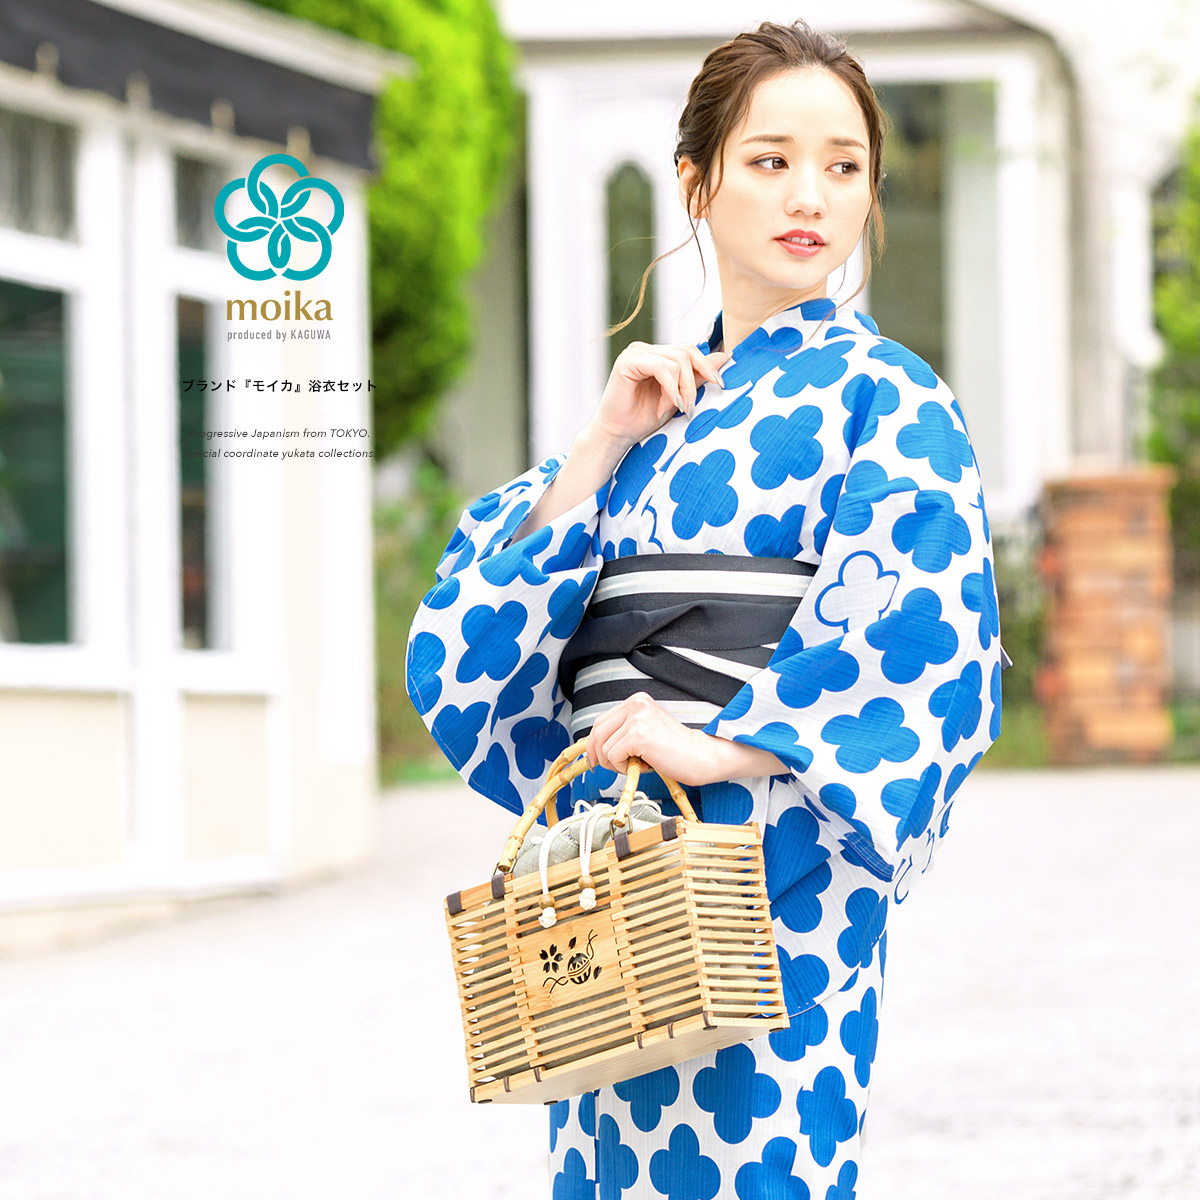 moika 浴衣 セット レディース 浴衣セット Mサイズ レトロ 青 ブルー 四つ葉 小紋 衿芯付き 女性用 仕立て上がり